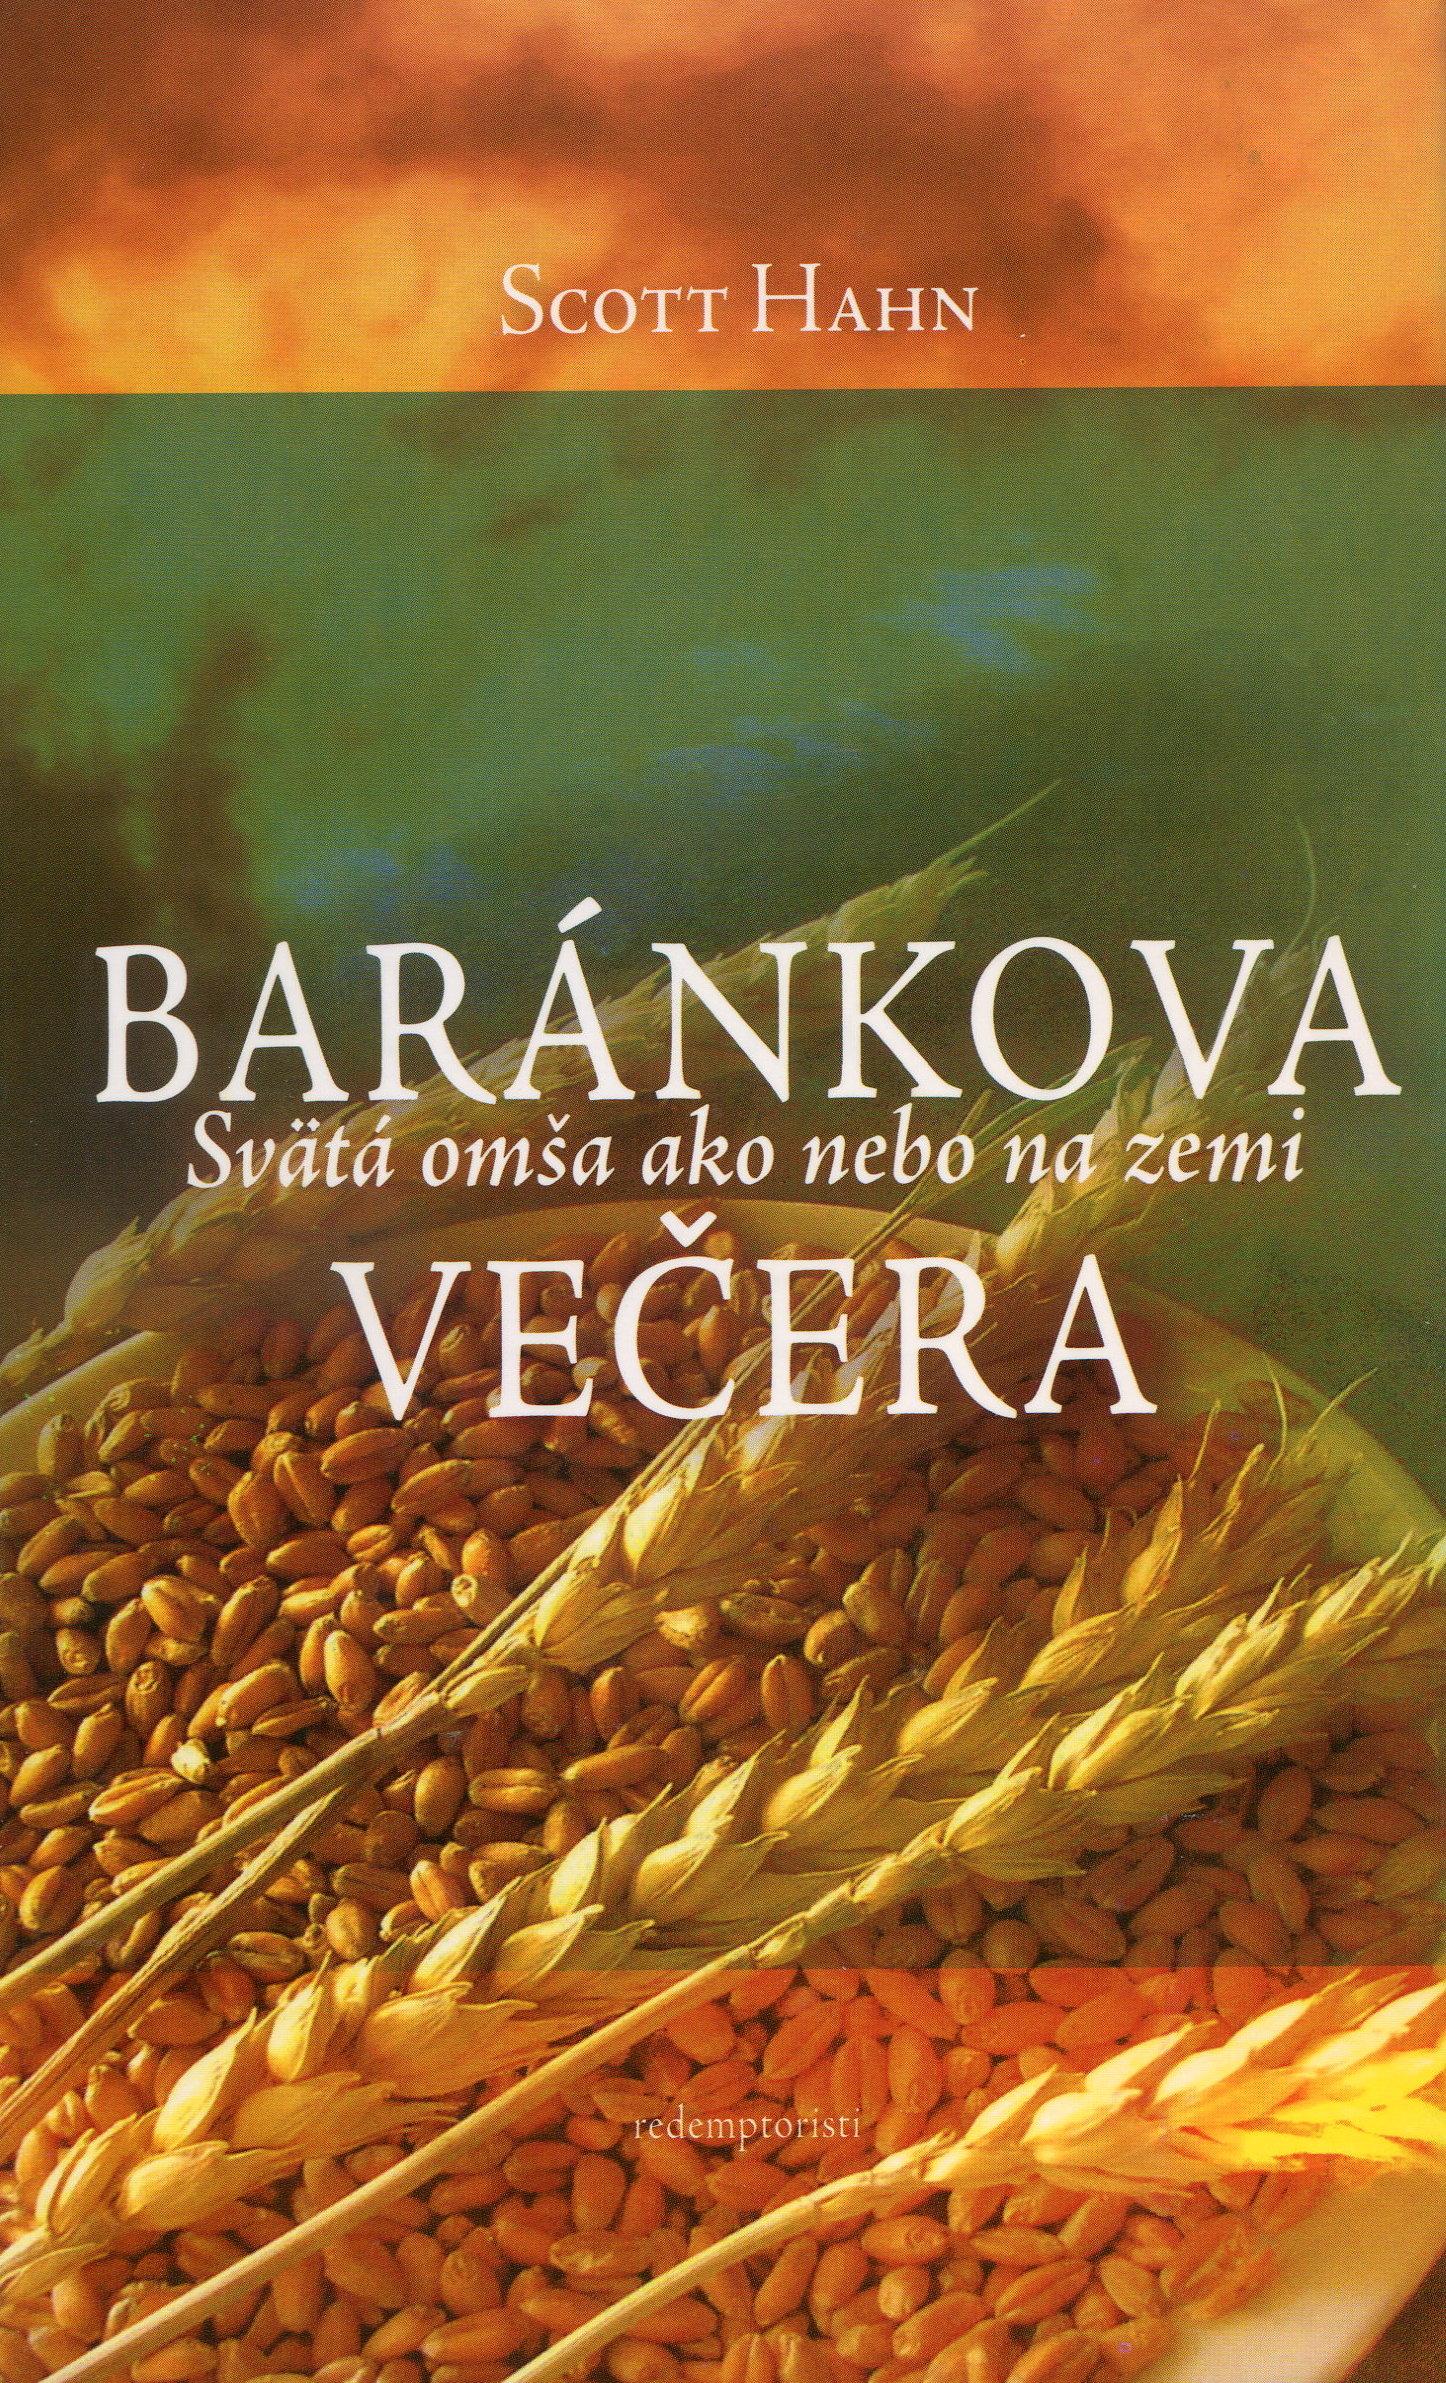 Baránkova večera - Svätá omša ako nebo na zemi